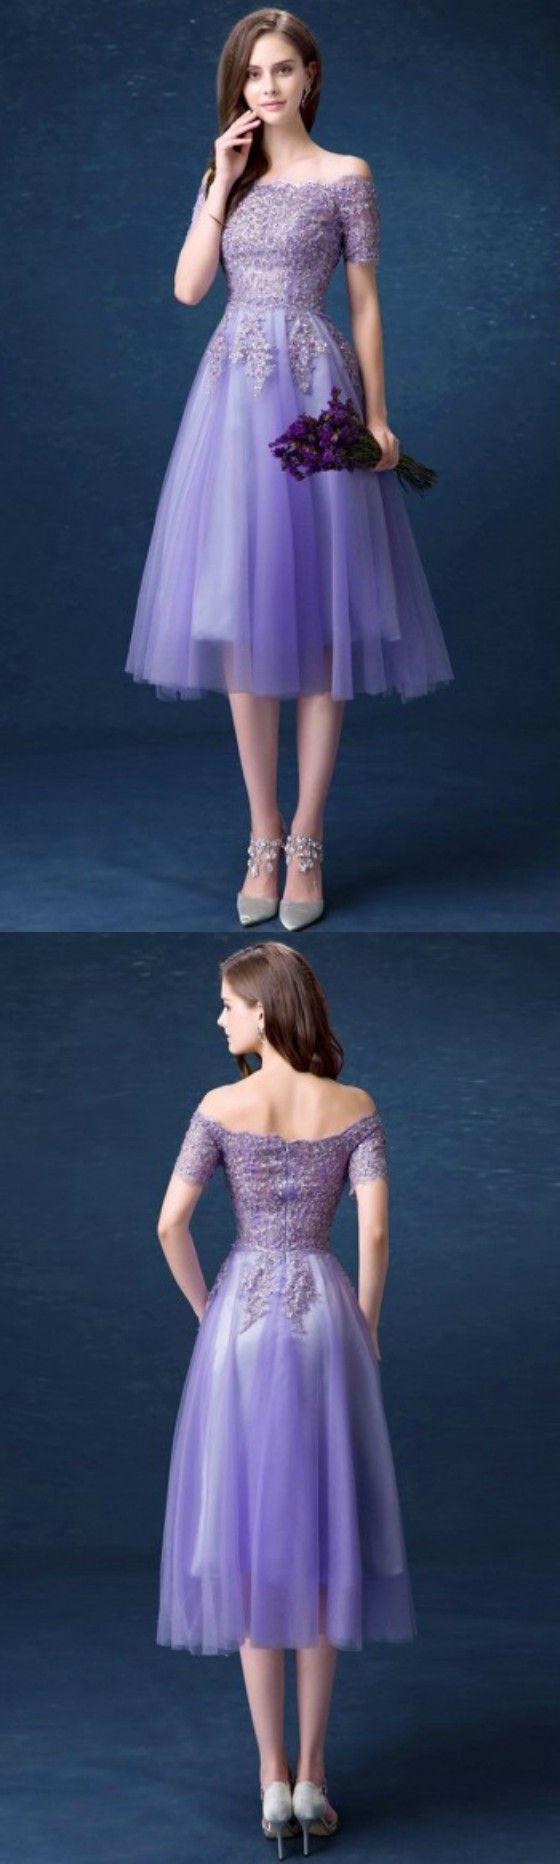 Modest Cheap Homecoming Dresses Purple Off the Shoulder Tea Length ...